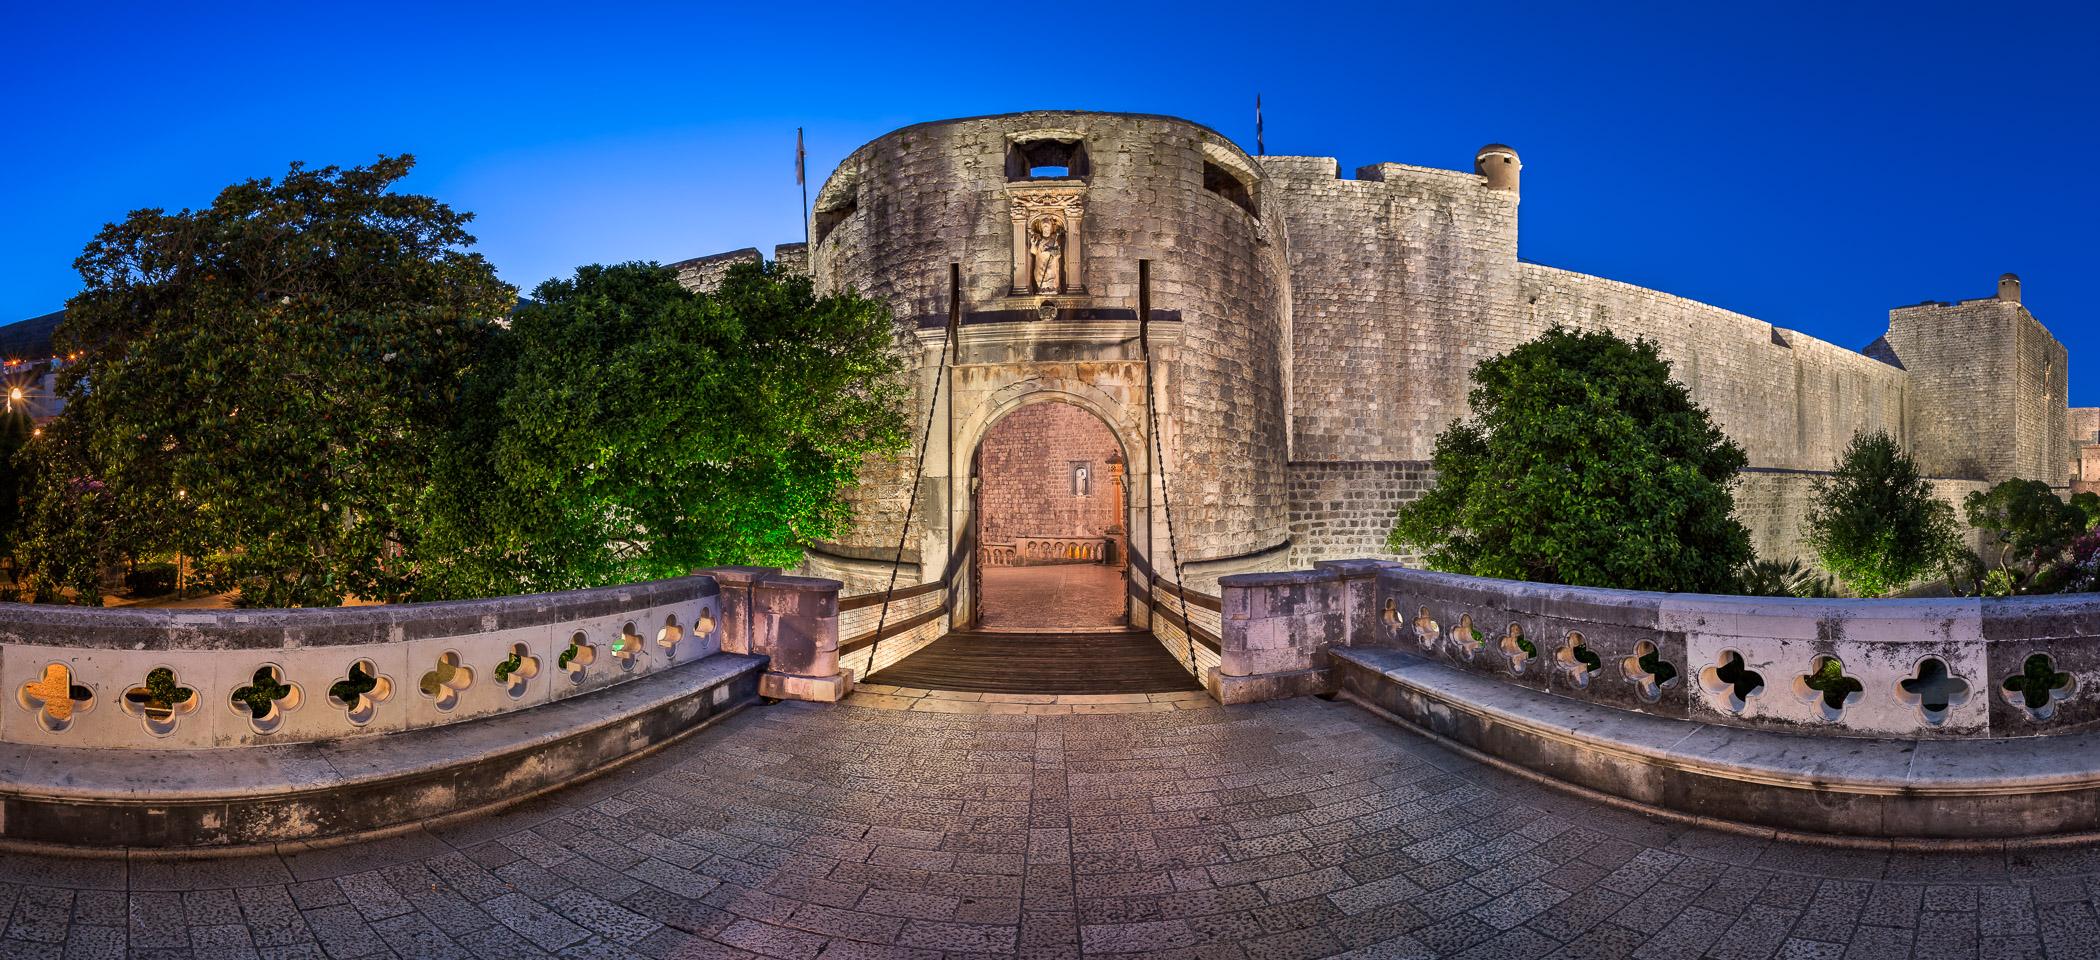 Dubrovnik Pile Gate and Draw Bridge in the Morning, Dubrovnik, Croatia